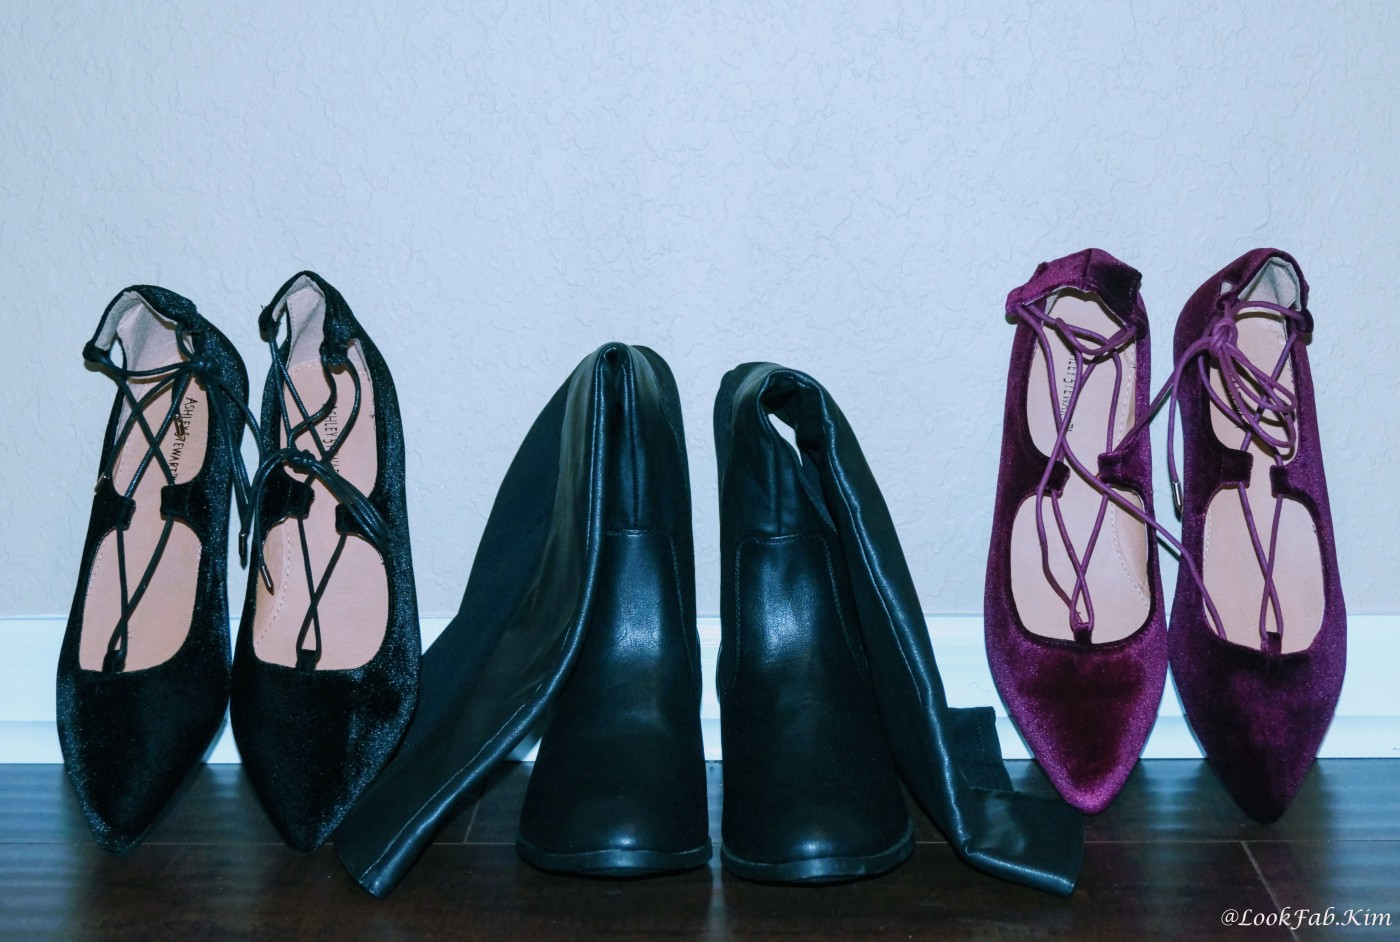 Lace Up Velvet Flat - Plum Purple, Mixed Media Tall Boot - Wide Calf Wide, and Lace Up Velvet Flat - Black